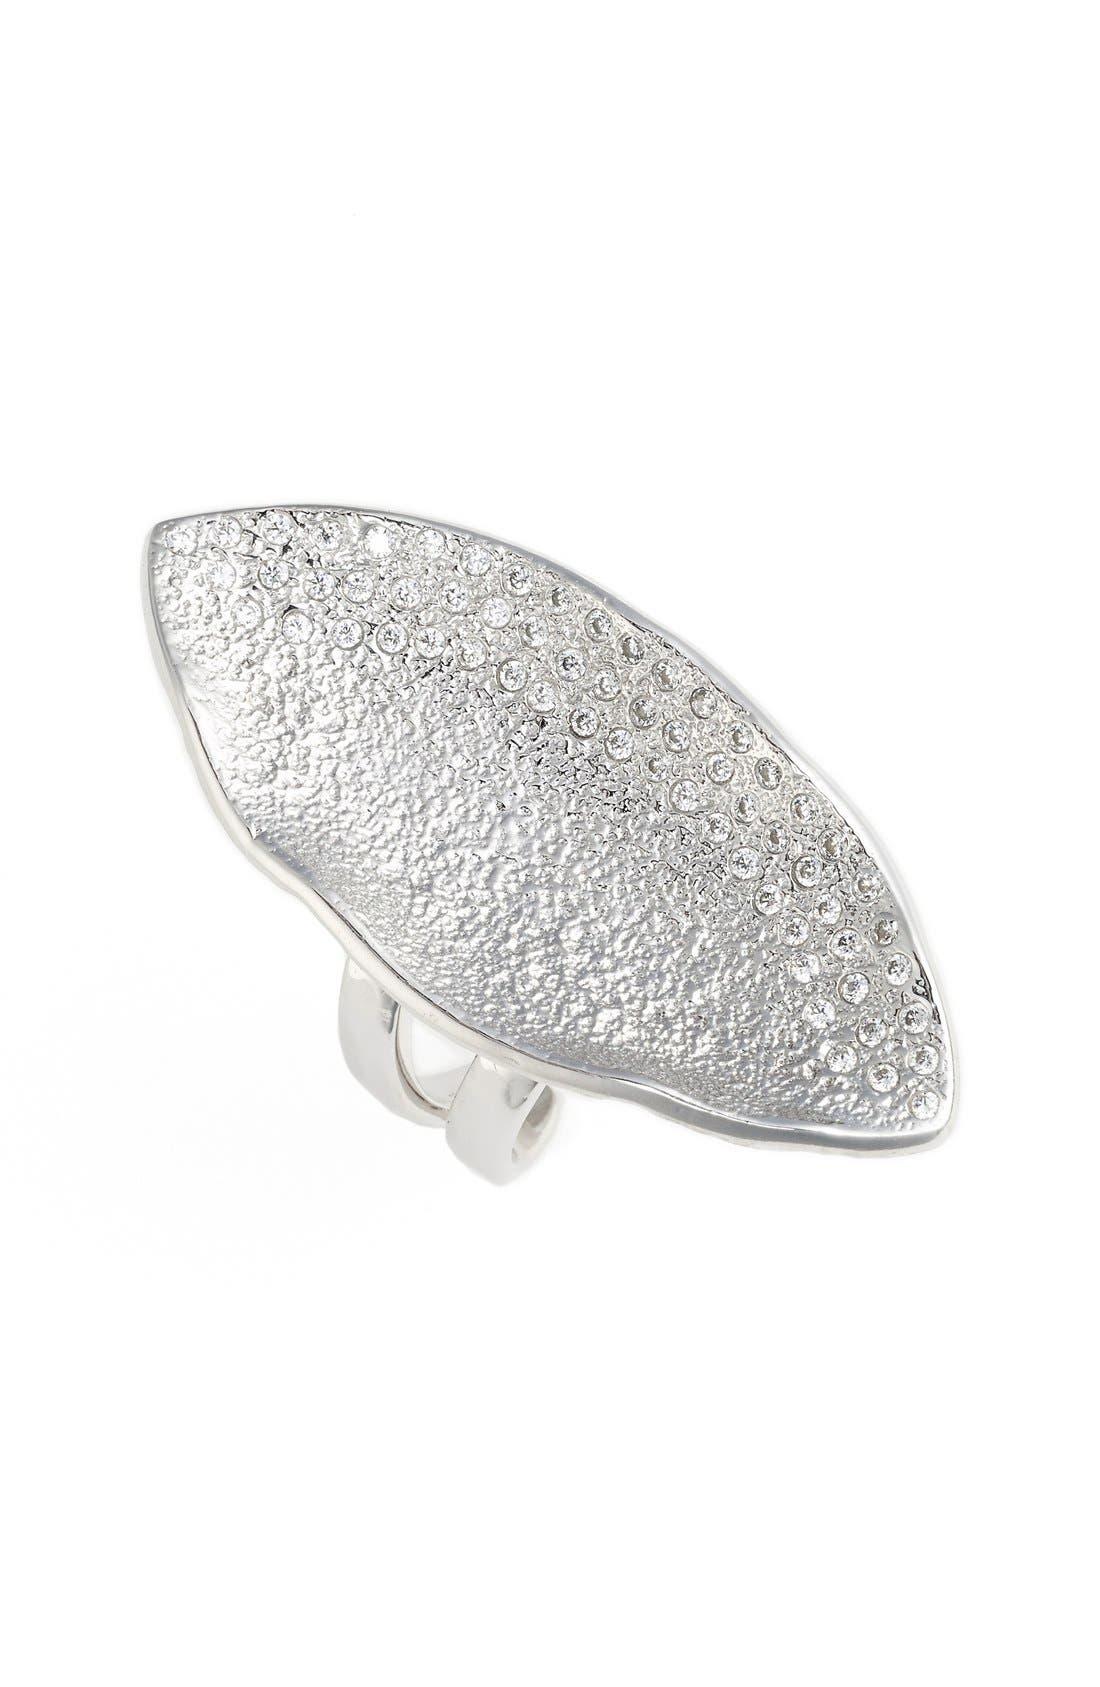 Main Image - Melinda Maria 'Mademoiselle' Pod Ring